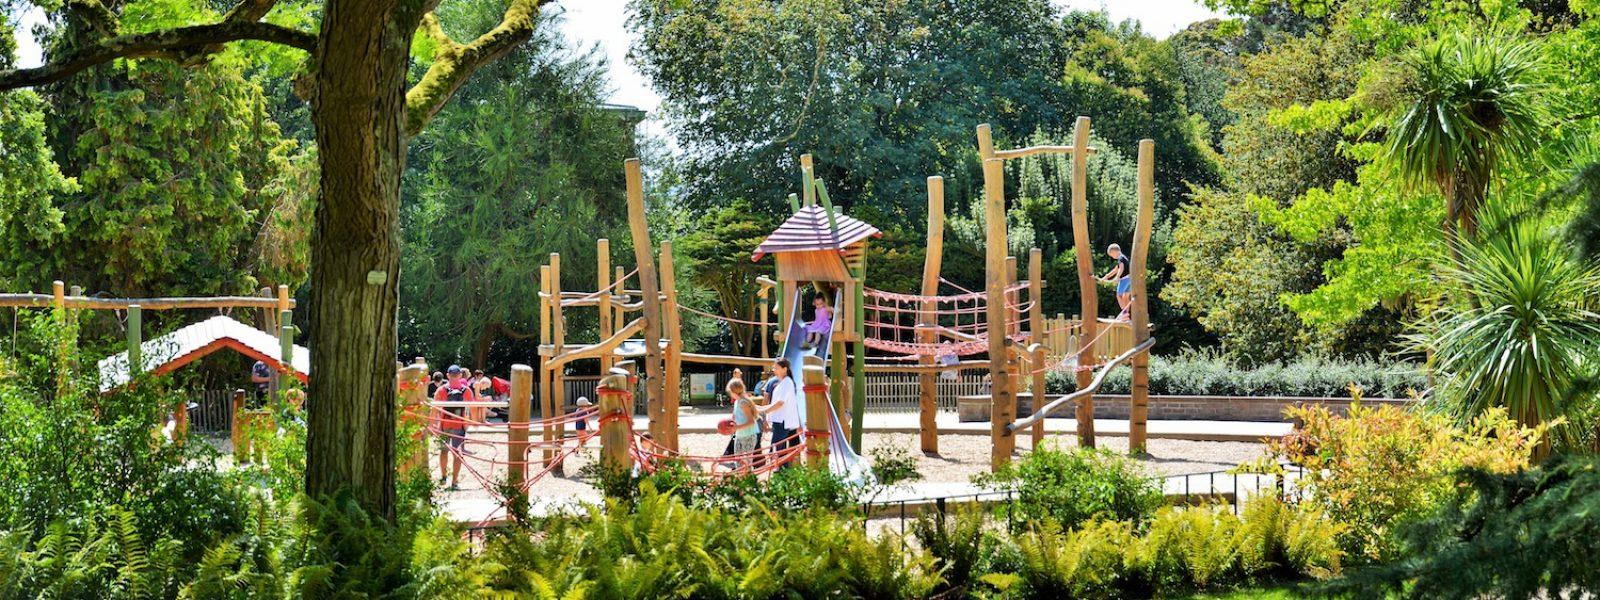 Jardin d'enfant au Thabor